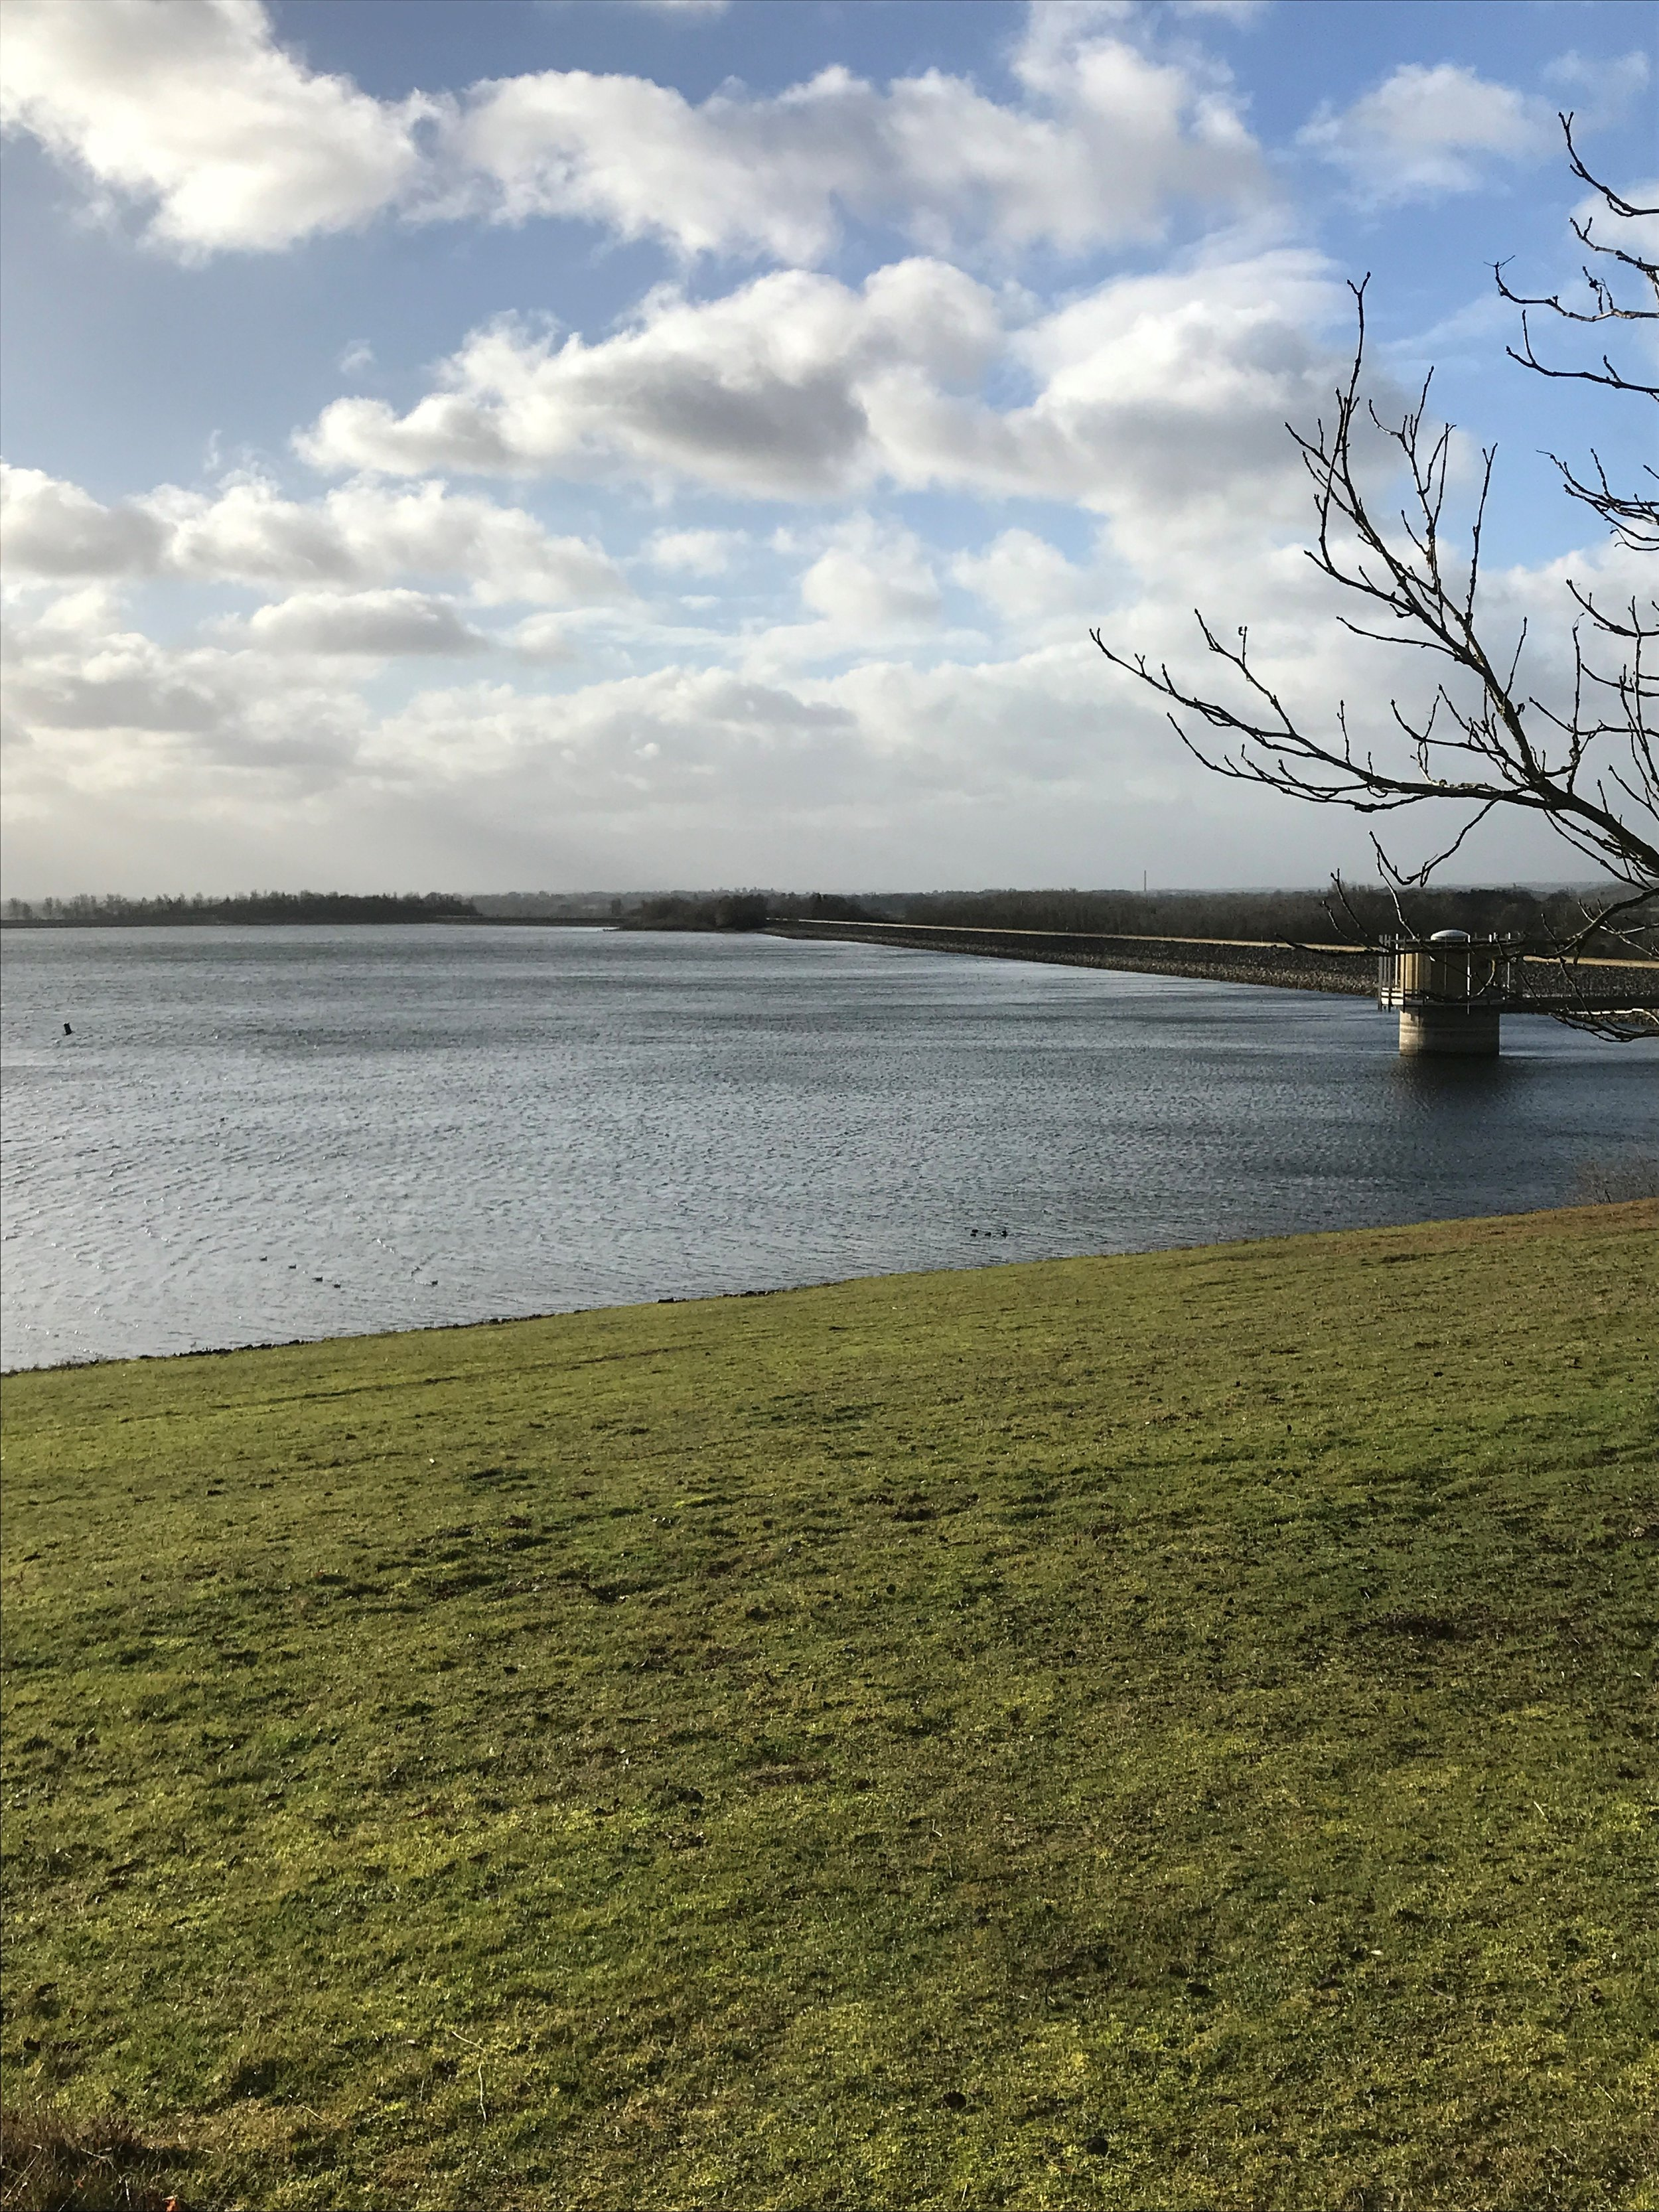 Pat Hipkiss Jan 2019 image 5 Draycote Water.jpg